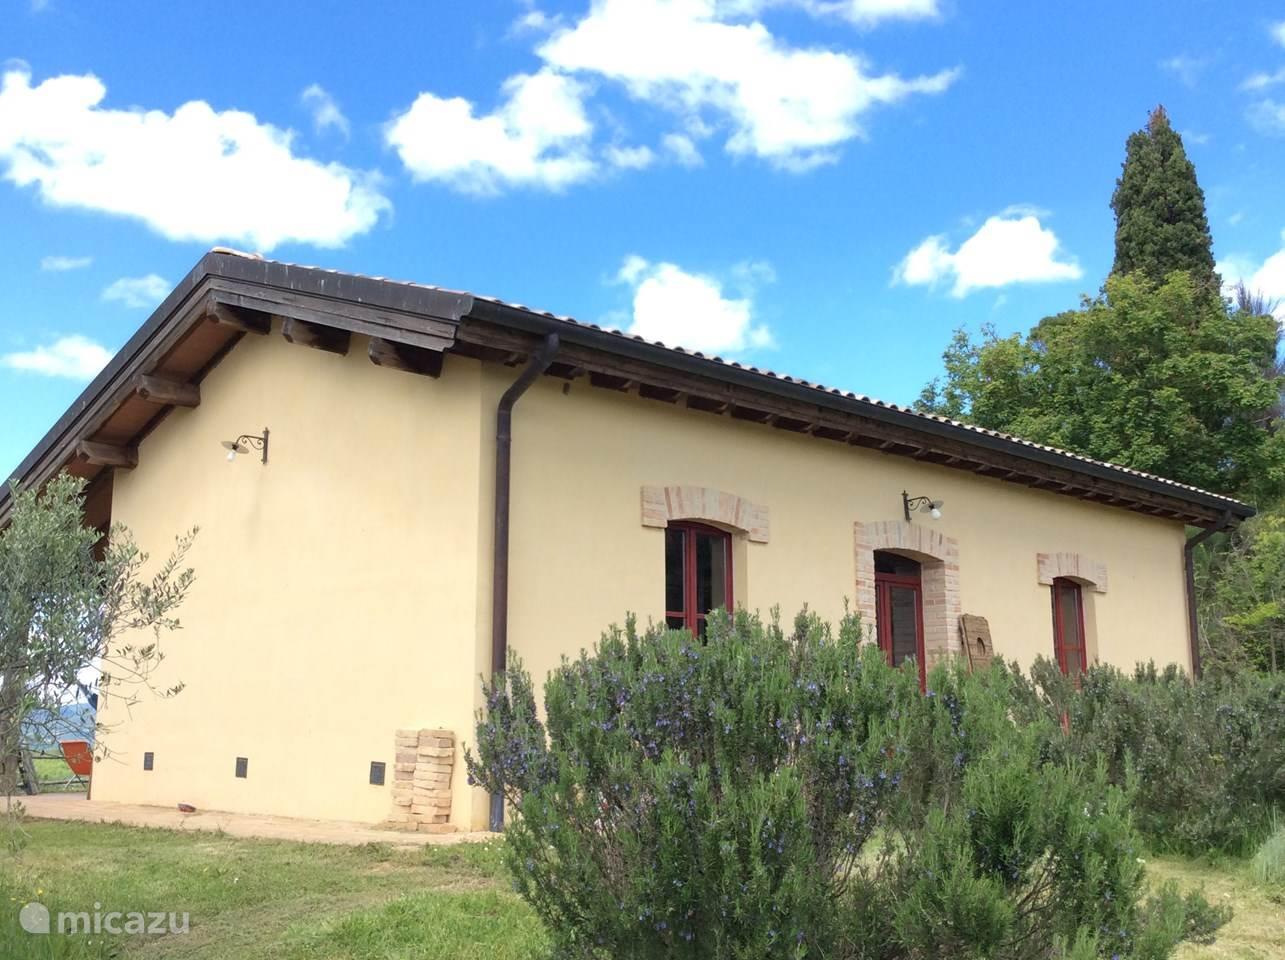 Vakantiehuis Italië – vakantiehuis Vakantiewoning Borgia